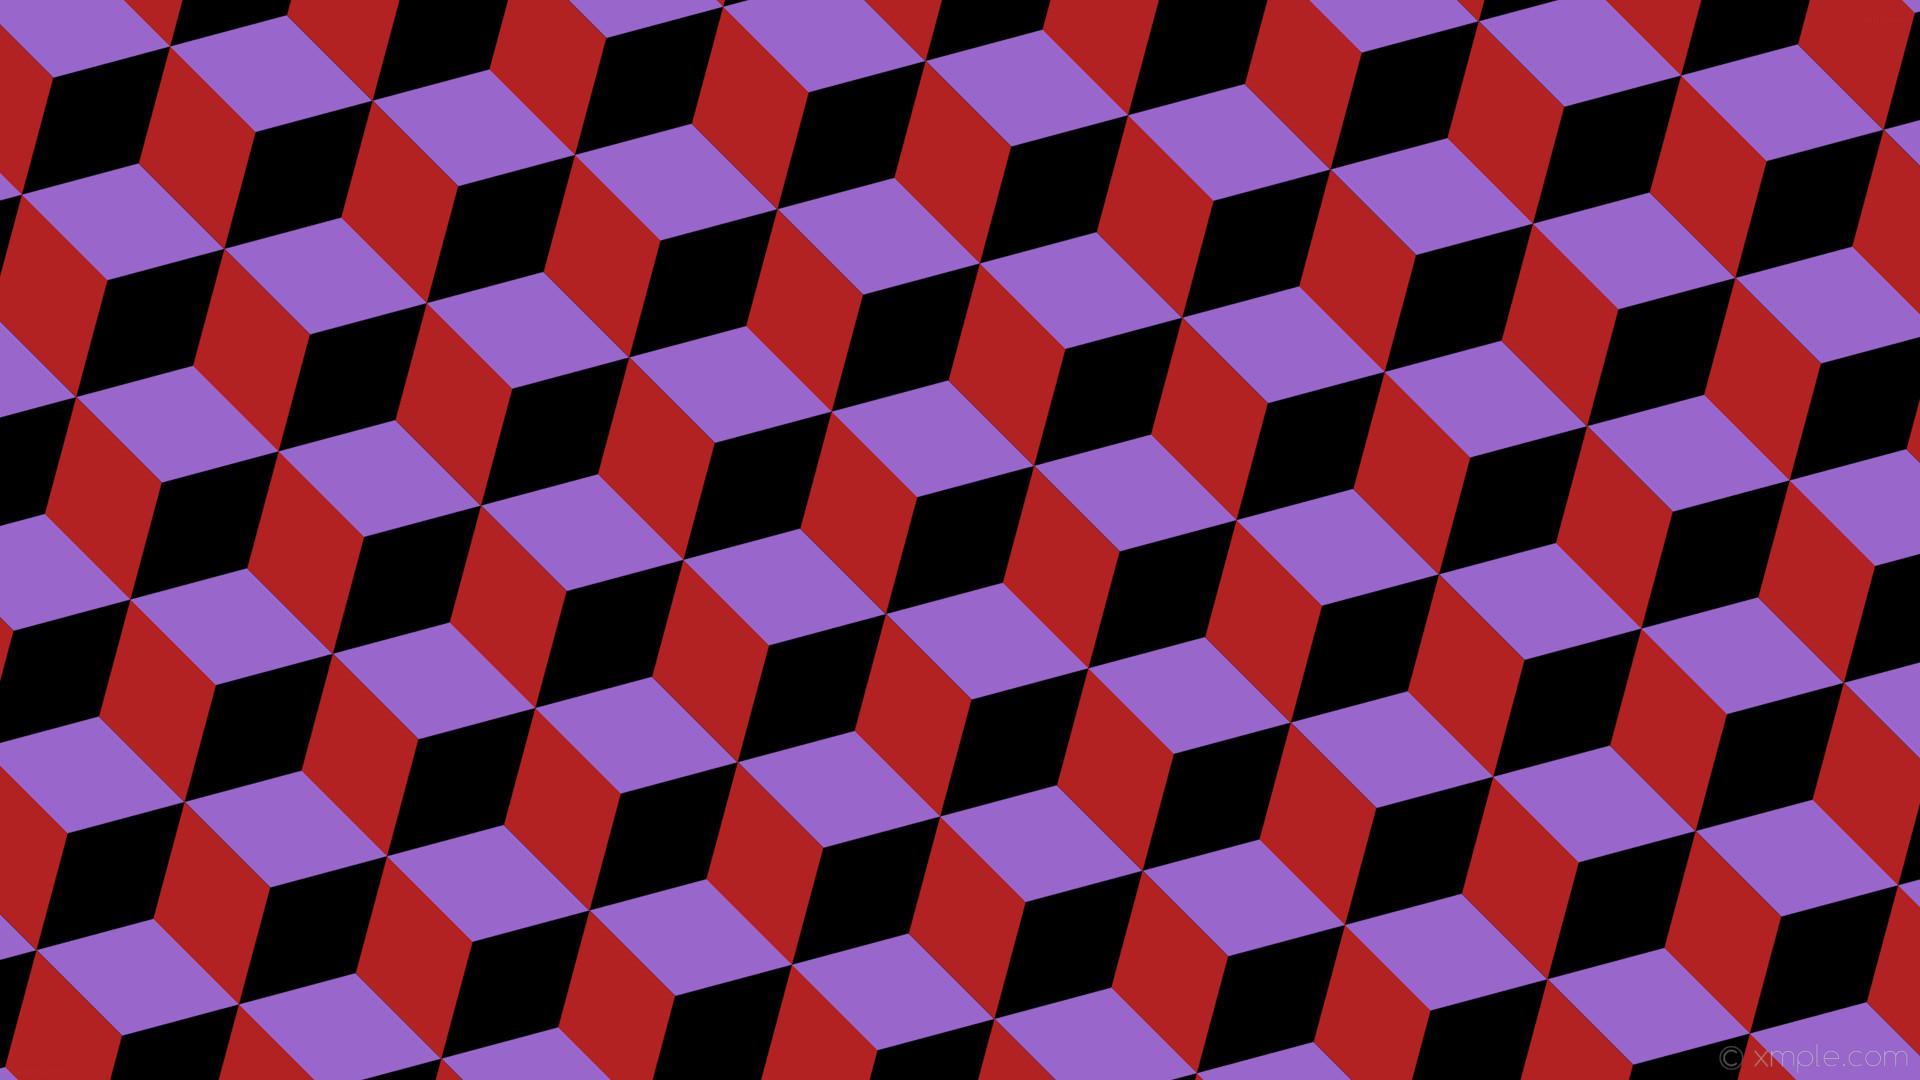 wallpaper red 3d cubes purple black amethyst fire brick #000000 #9966cc  #b22222 45